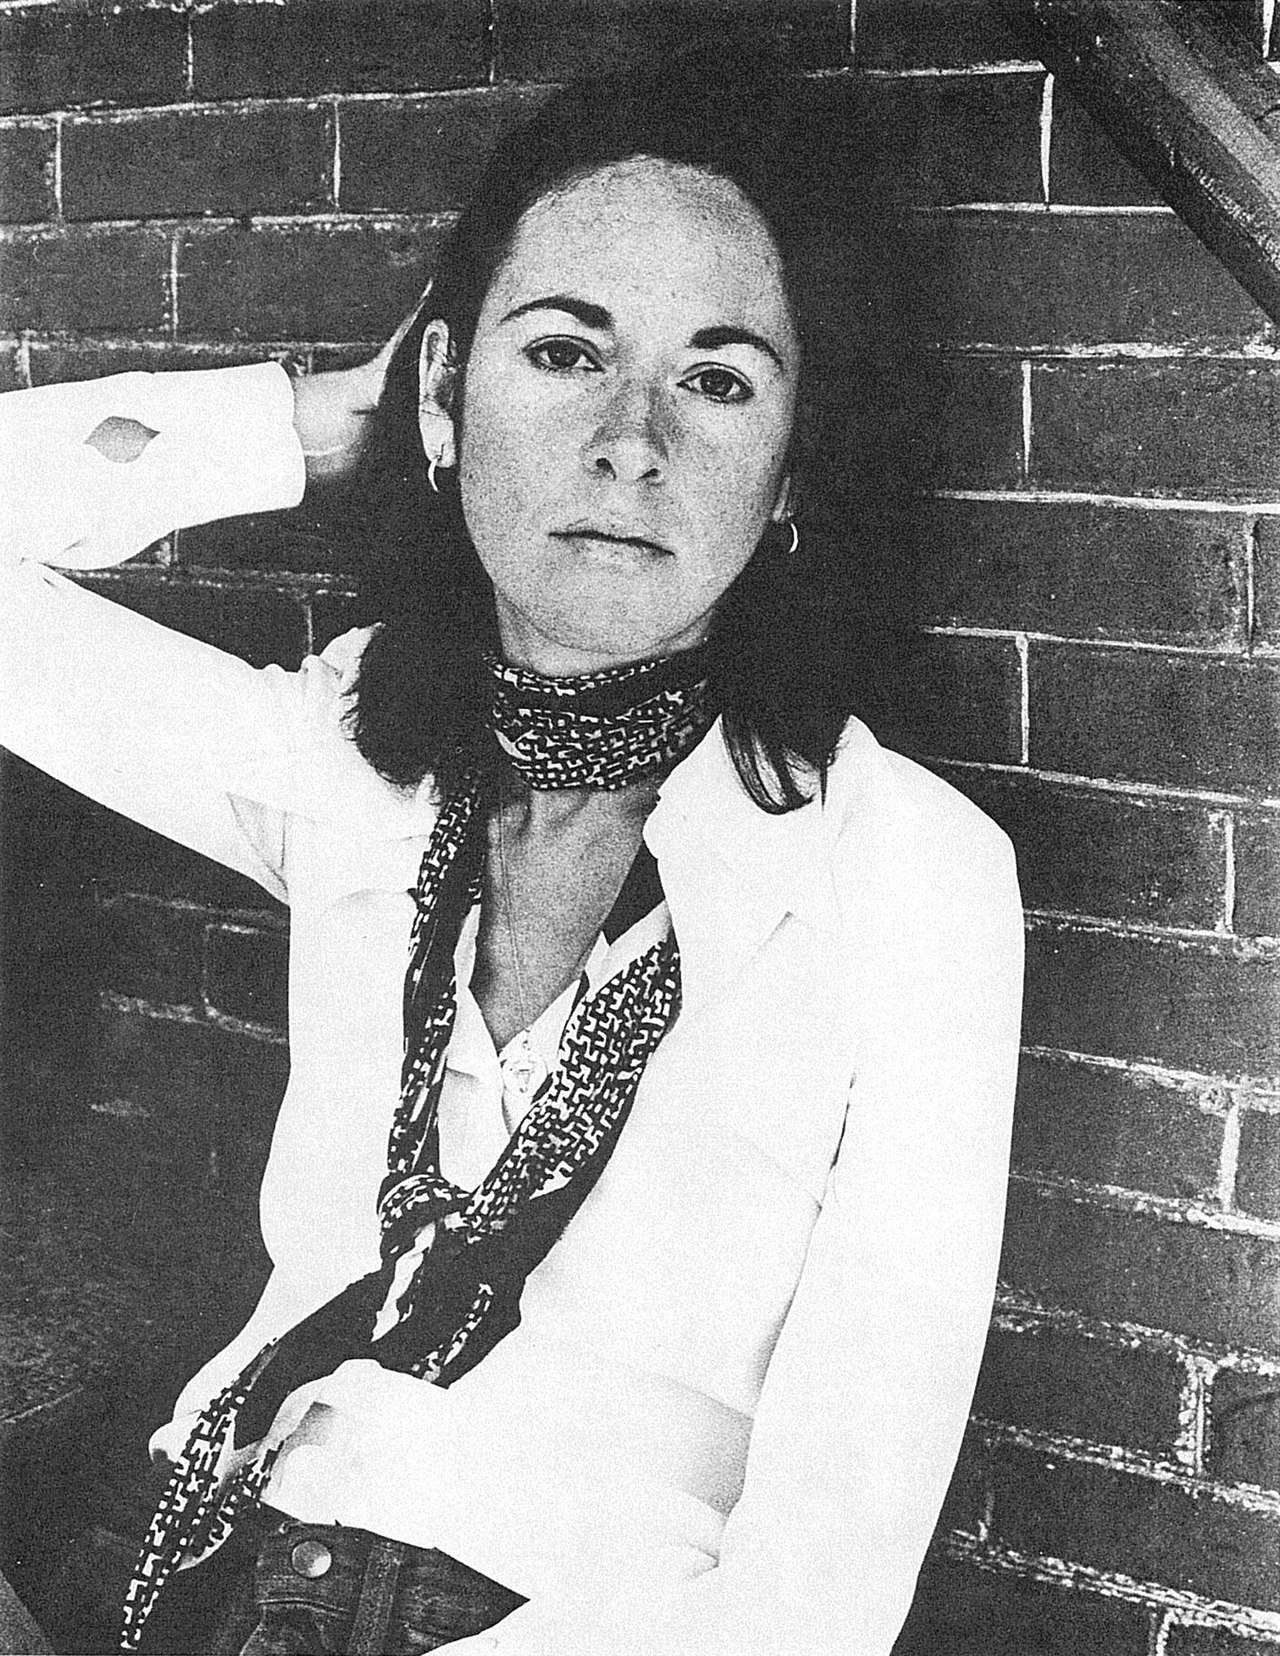 Glück c. 1977